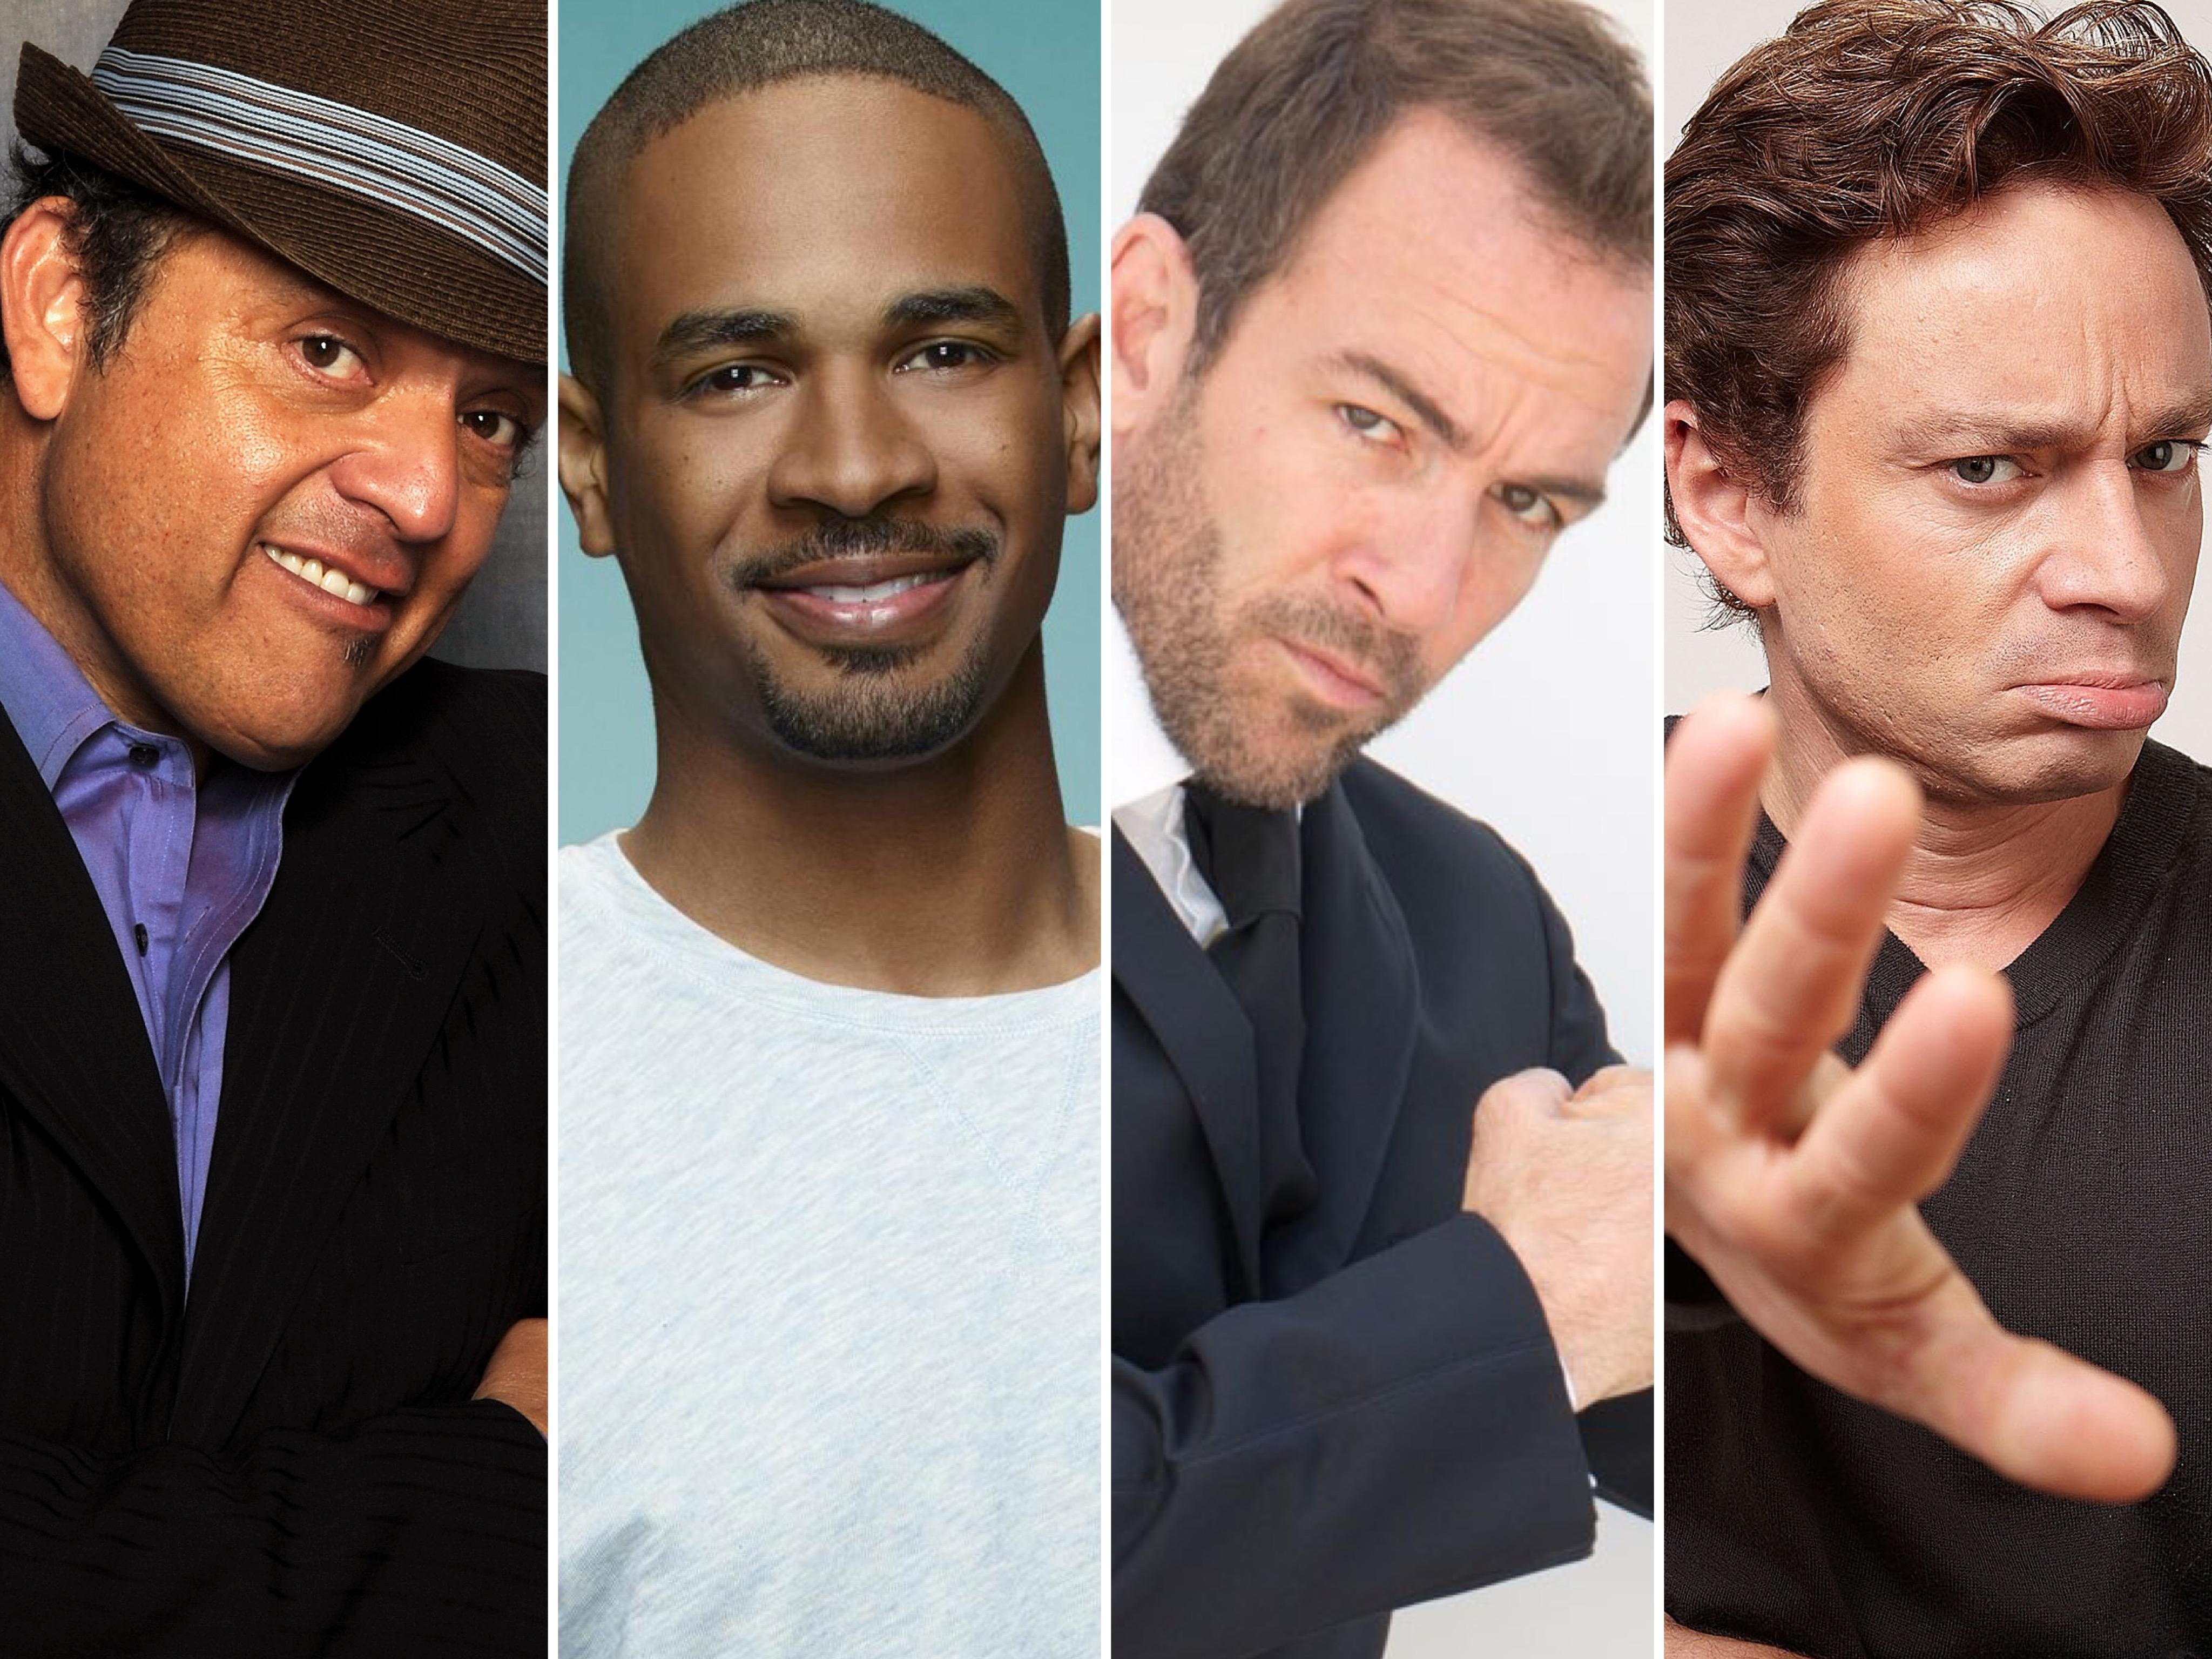 Bryan Callen, Chris Kattan, Damon Wayans Jr, Paul Rodriguez and More